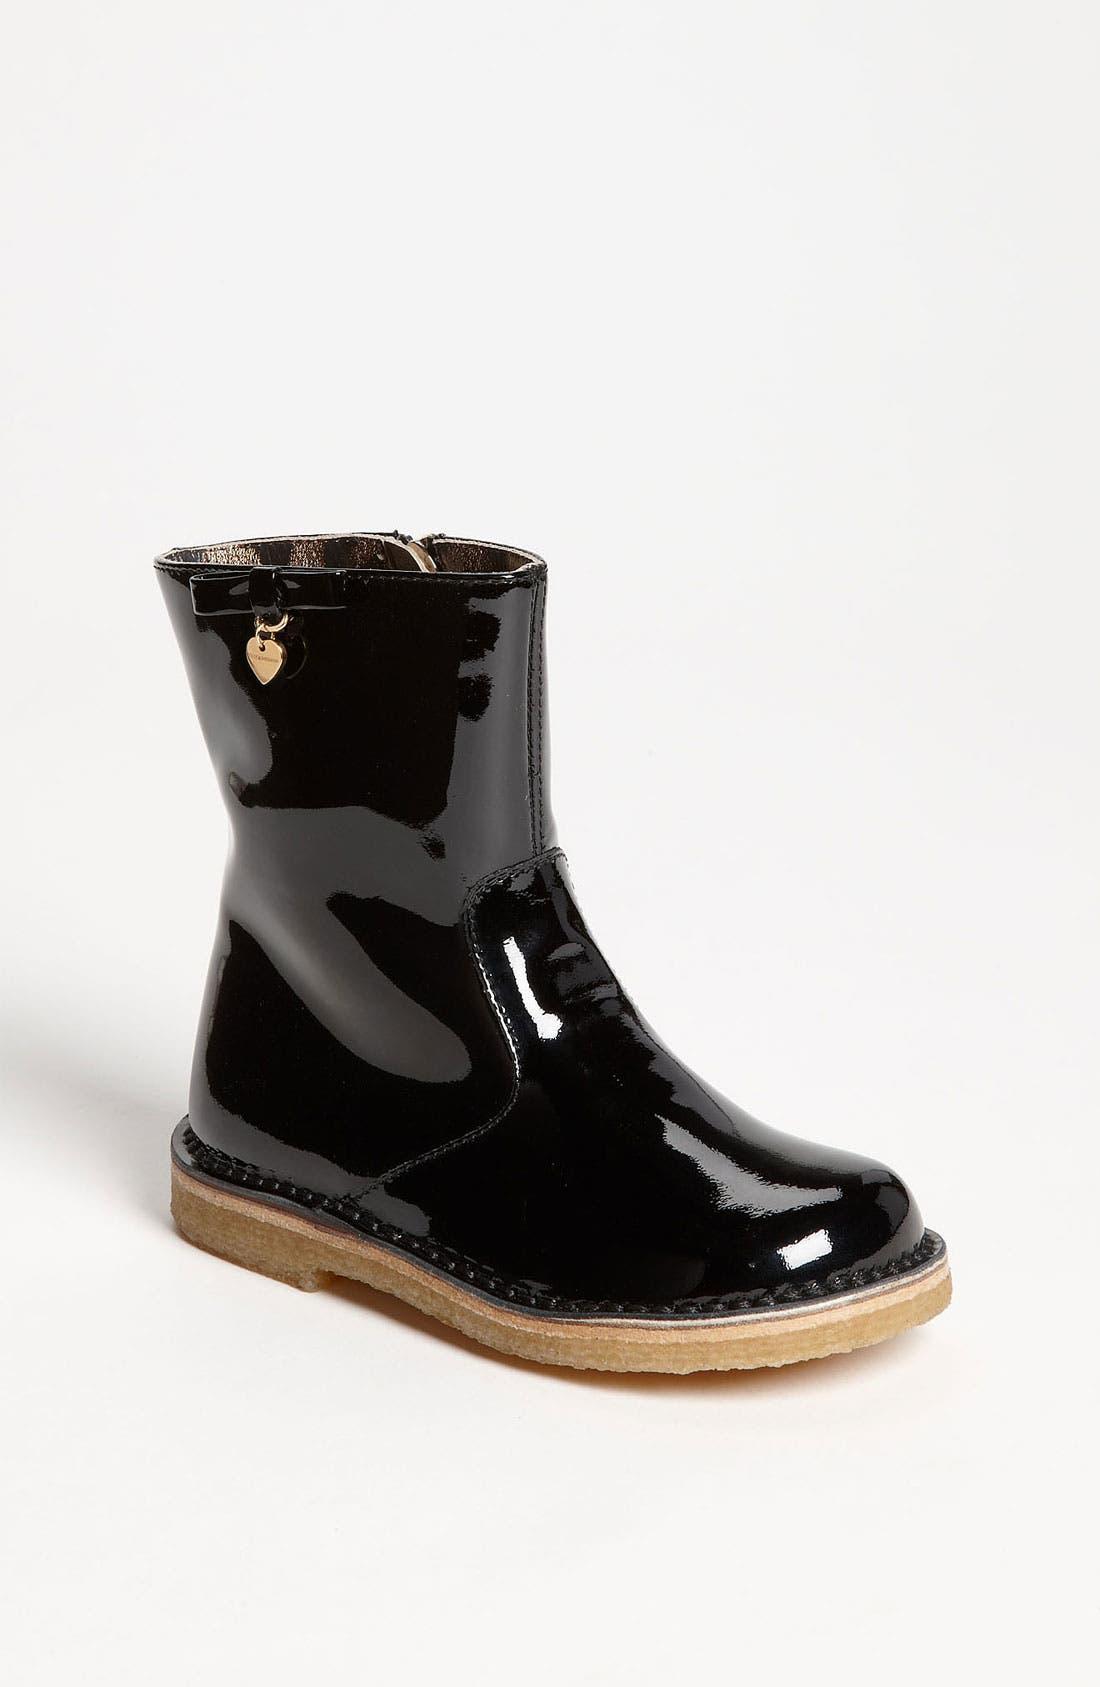 Alternate Image 1 Selected - Dolce&Gabbana Patent Boot (Walker & Toddler)